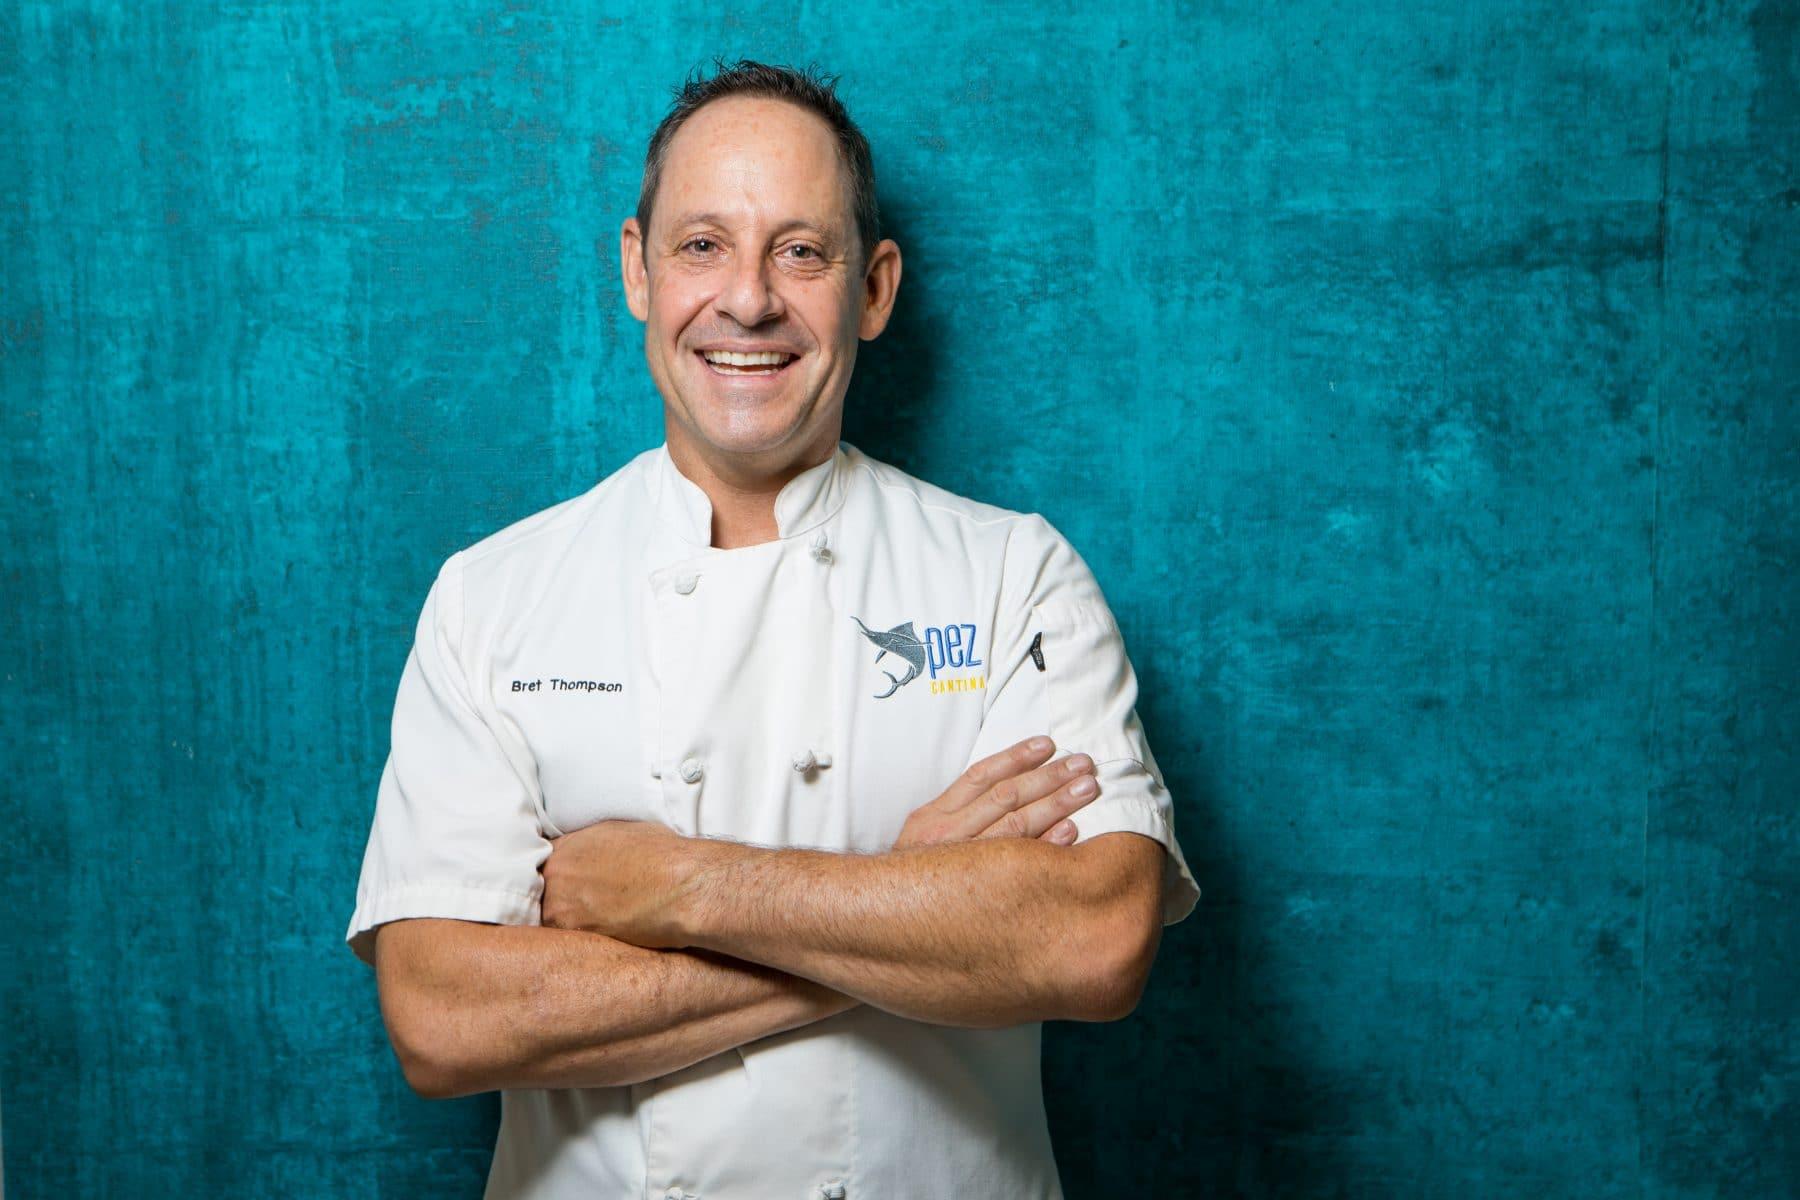 Chef Bret Thompson